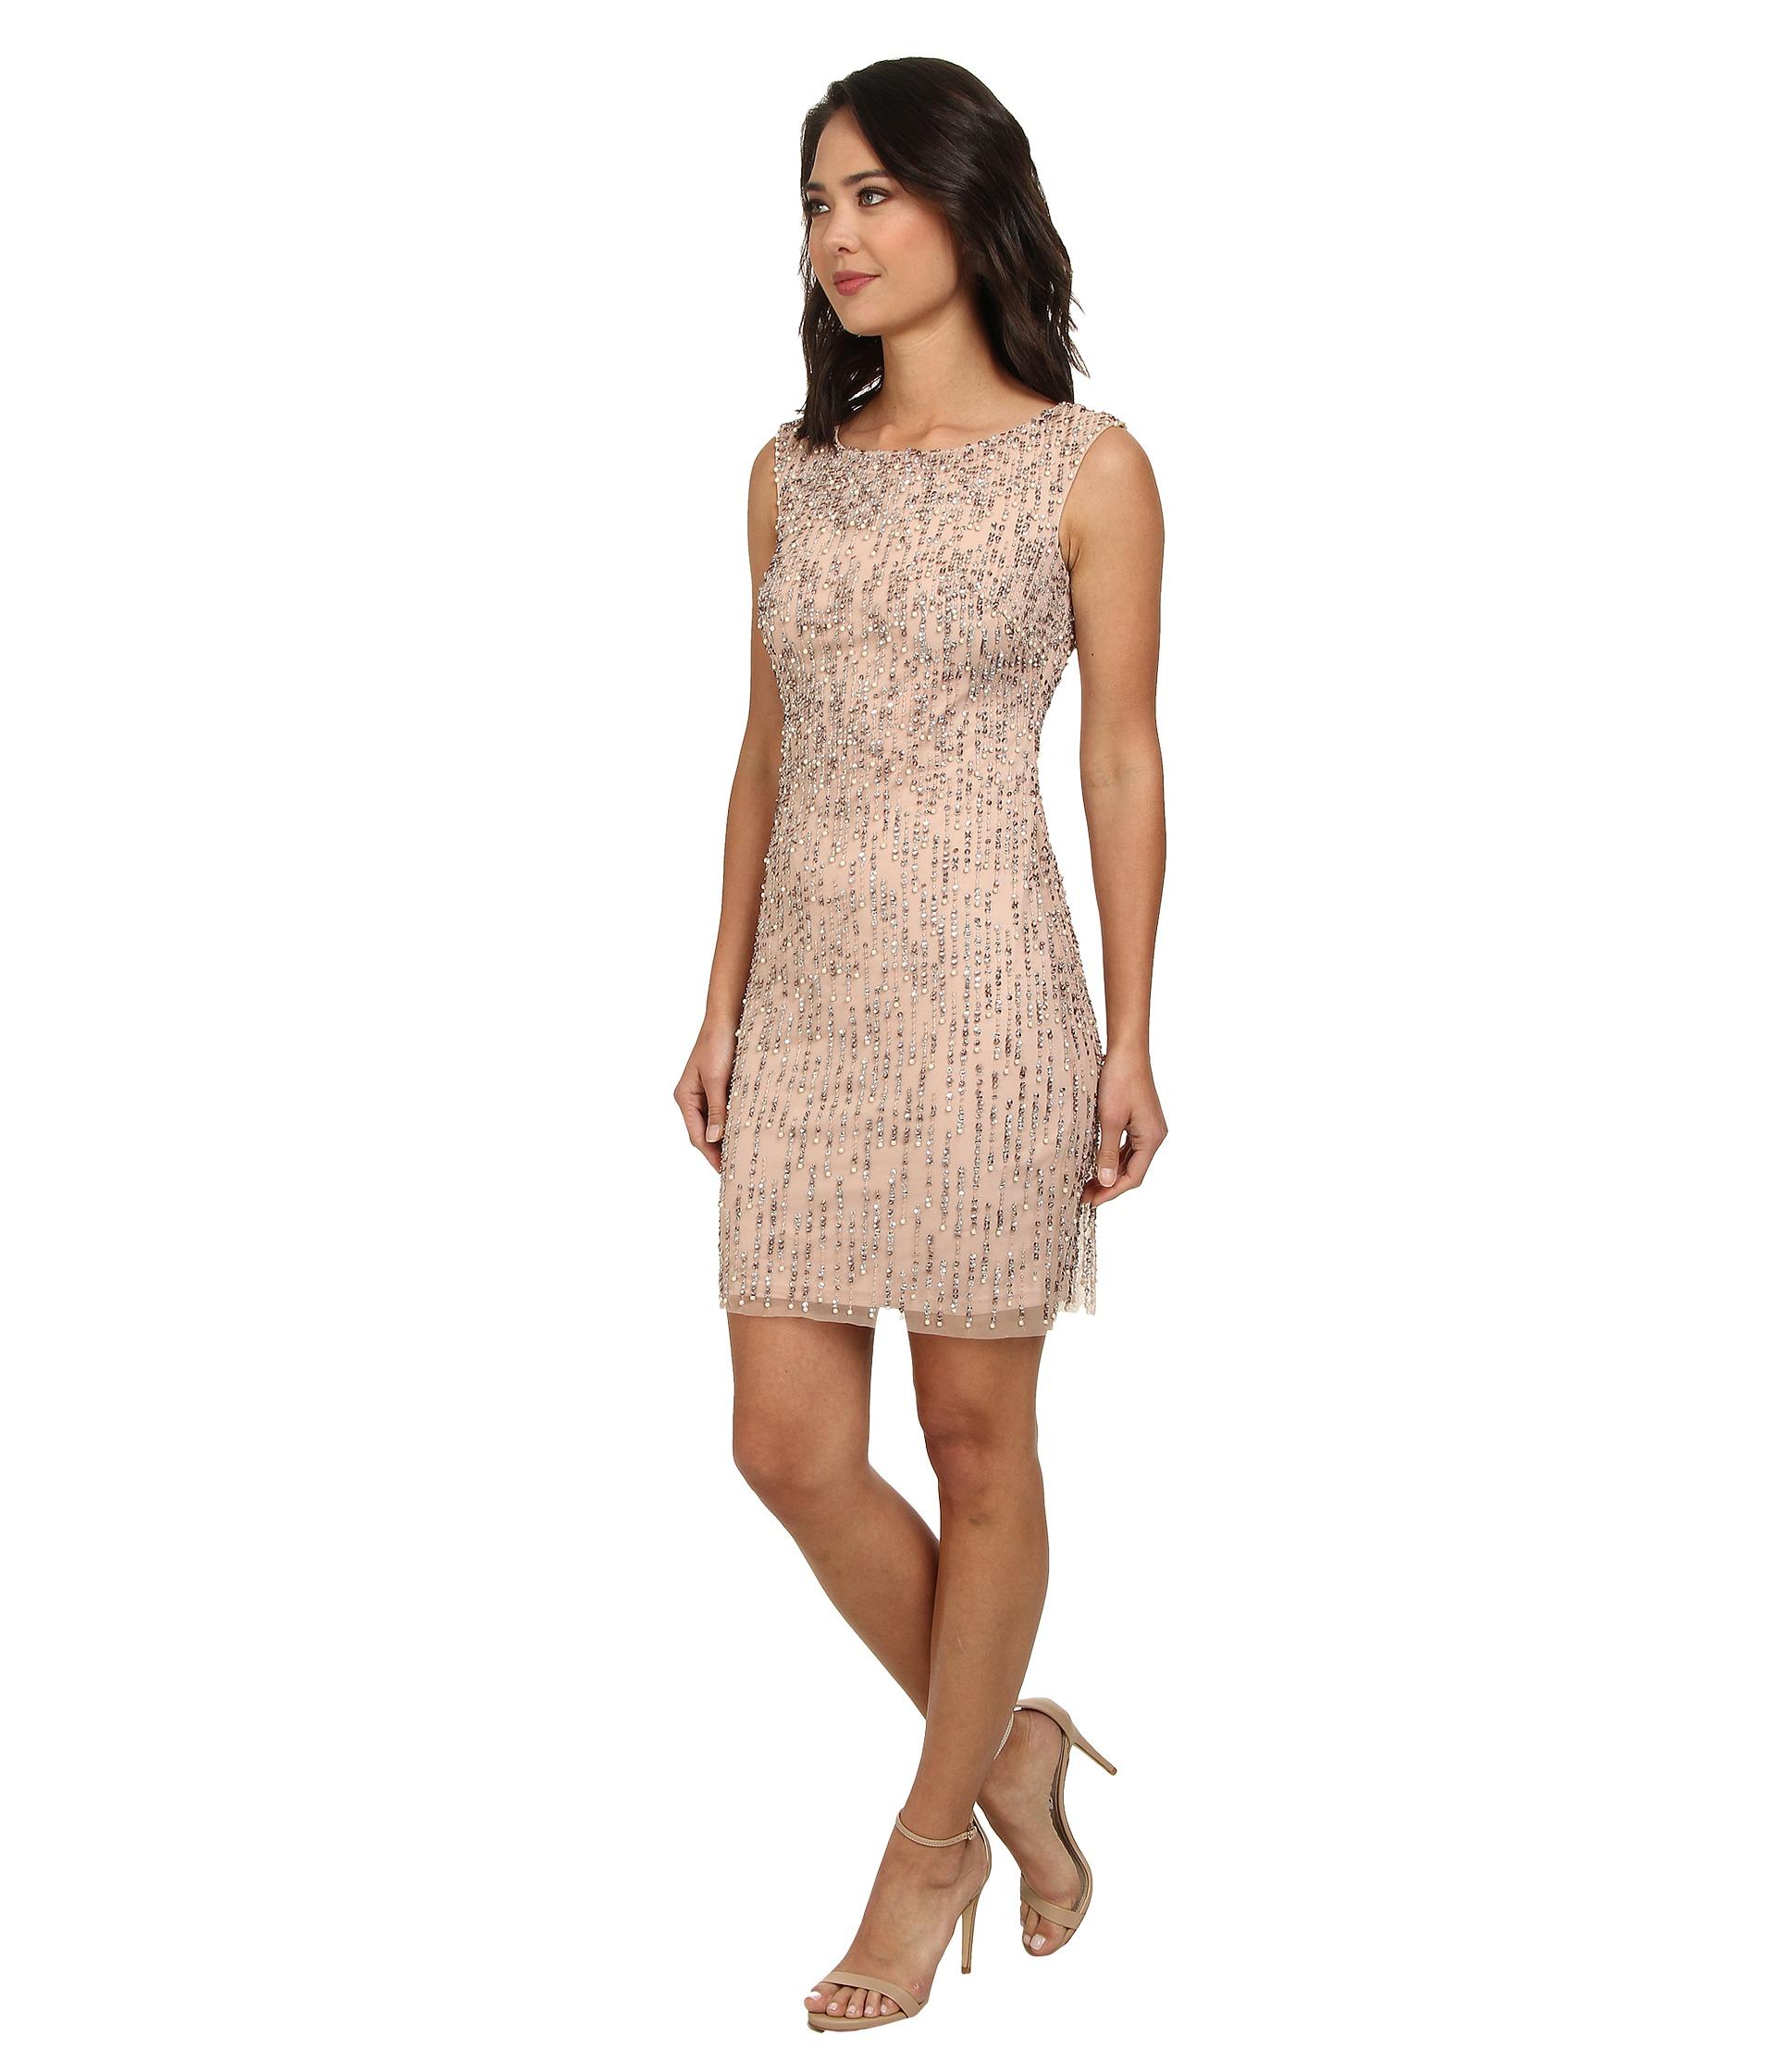 Adrianna Papell Sleeveless Fully Beaded Cocktail Dress - 6pm.com